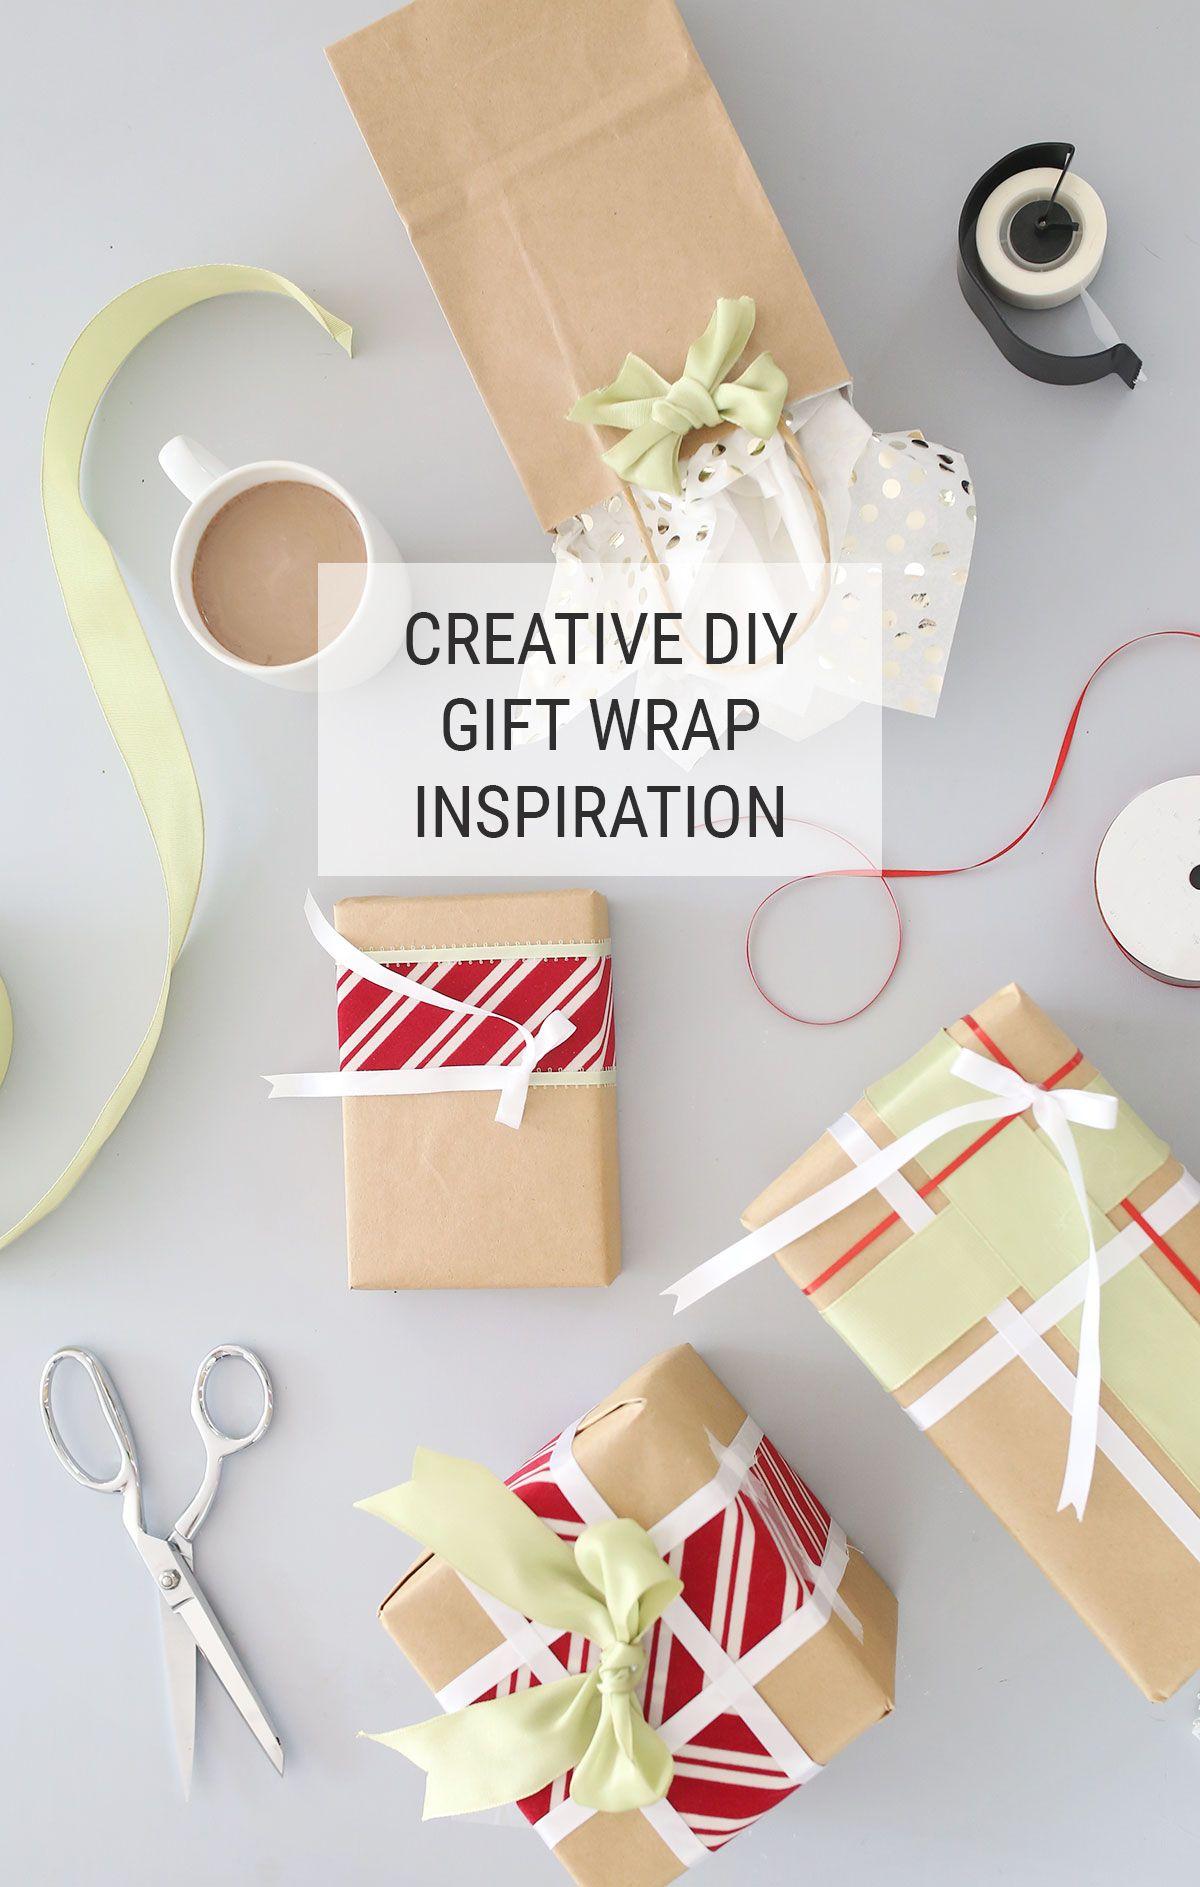 Starbucks Share the Cheer Sweepstakes | Christmas & New Years Eve ...